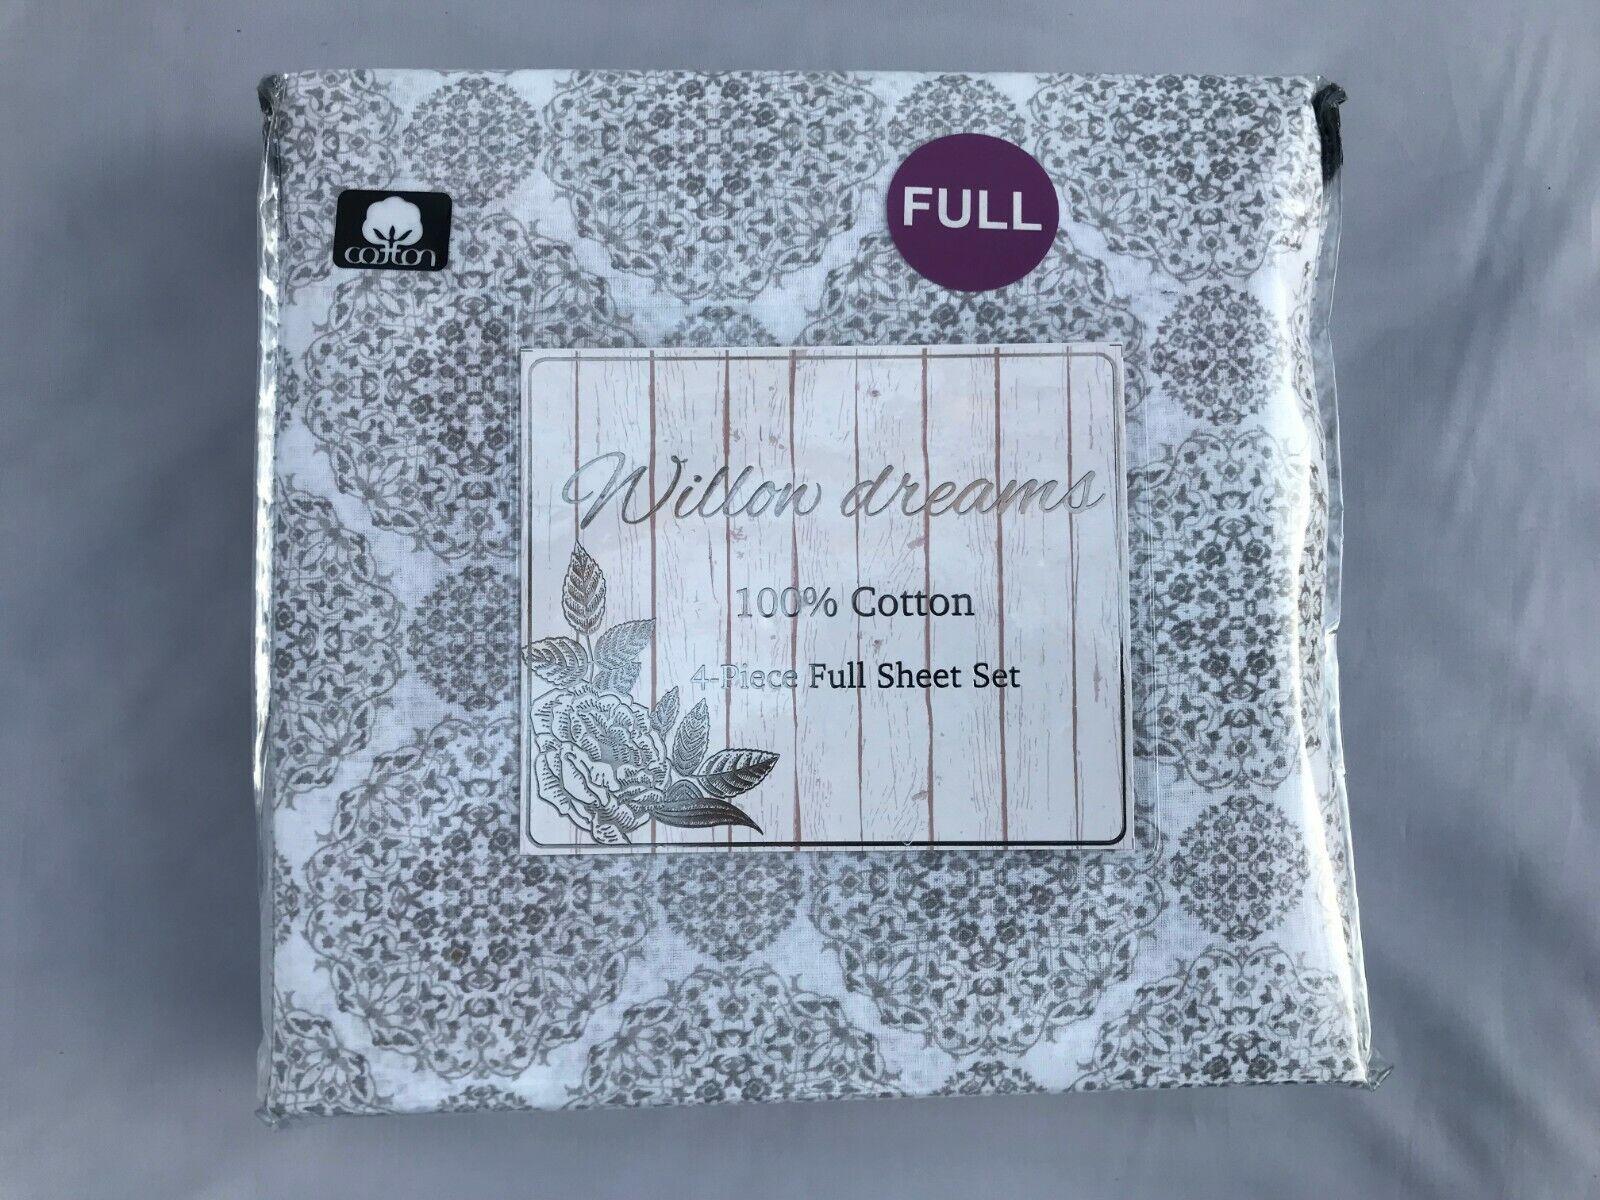 4 Piece Printed Full Sheet Set 100% Cotton Full Größe Willon Dreams